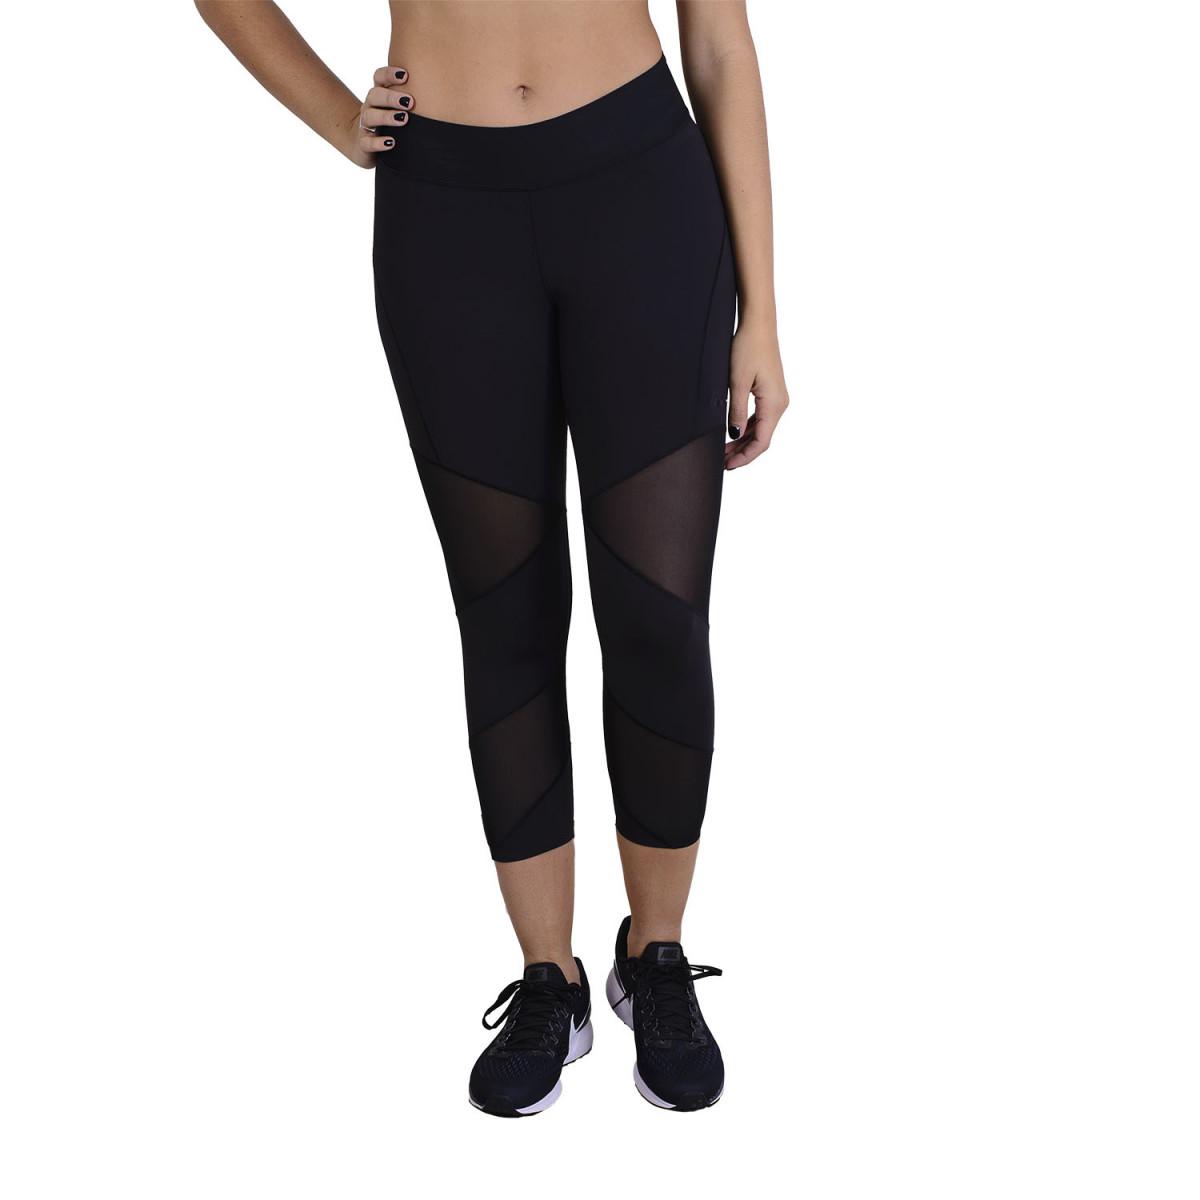 Calza Nike Fly Lux